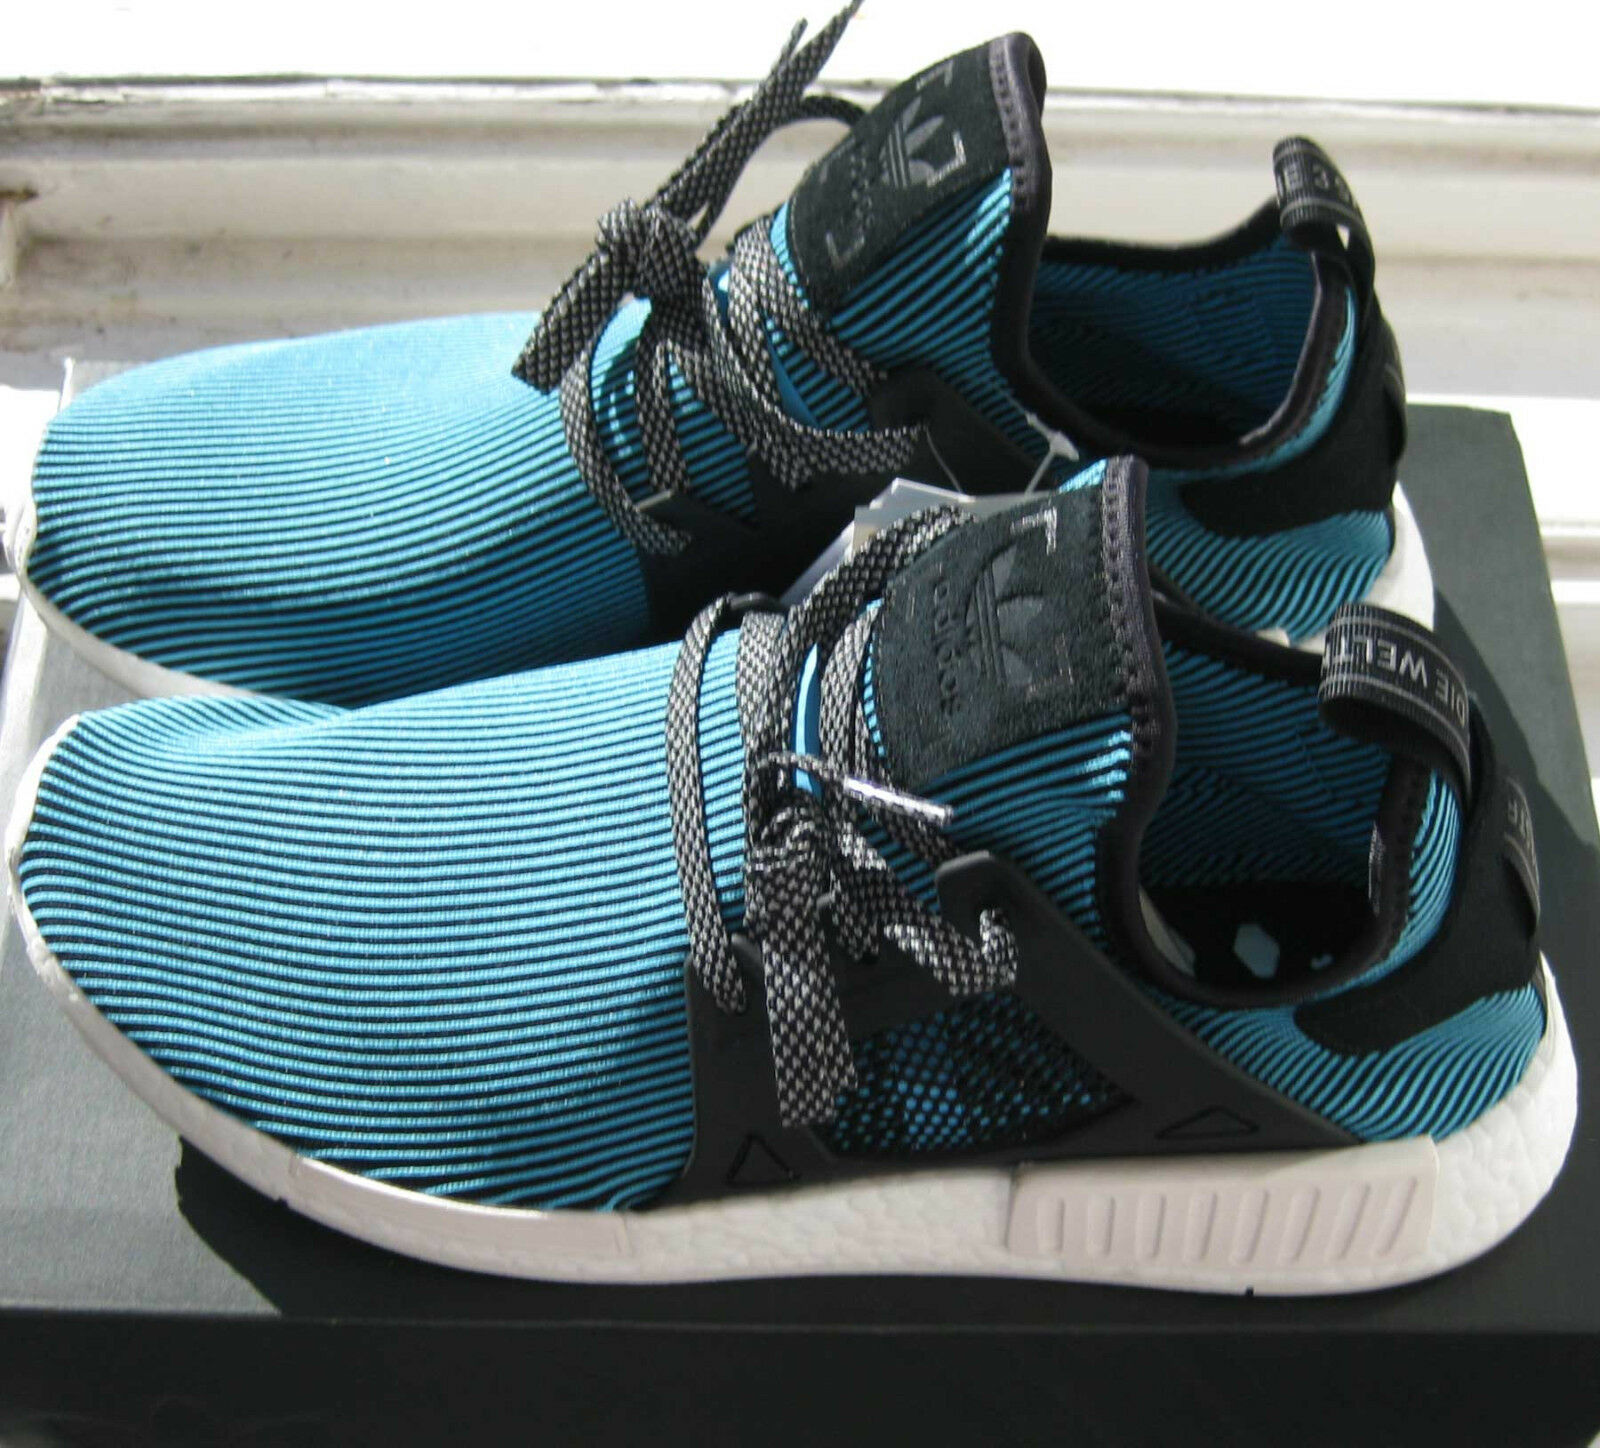 Adidas nmd xr1 pk bright eu:40 cyan / Blau primeknit eu:40 bright us:7 neu 6bef9e